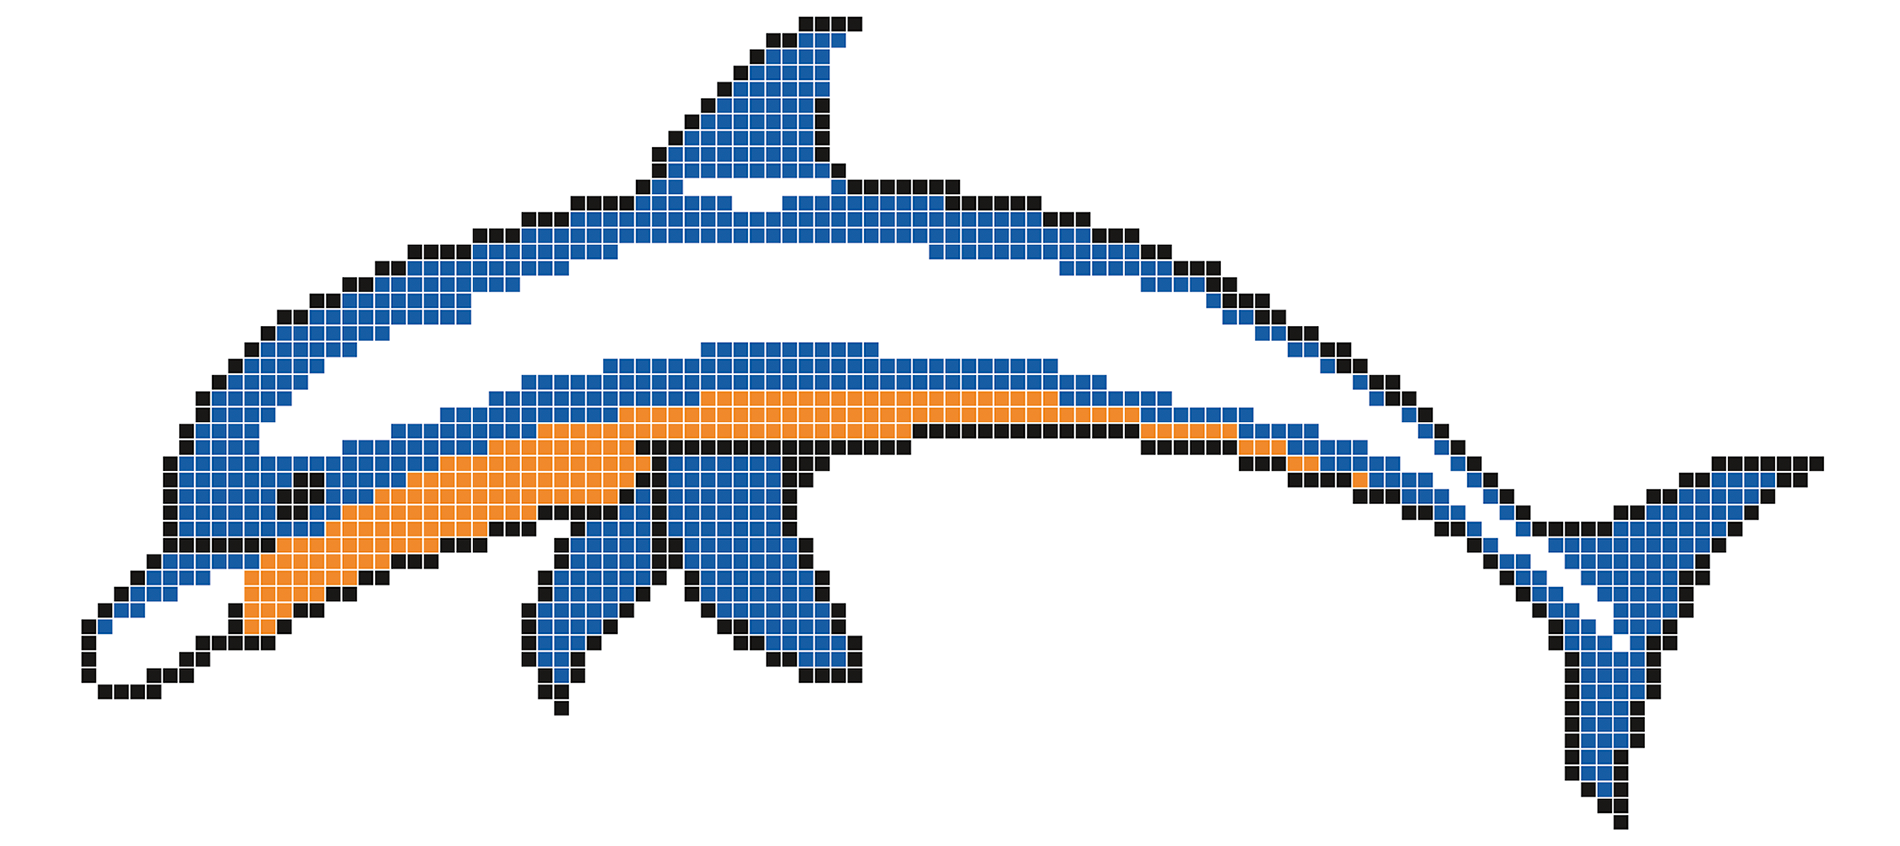 slike delfina za bazene